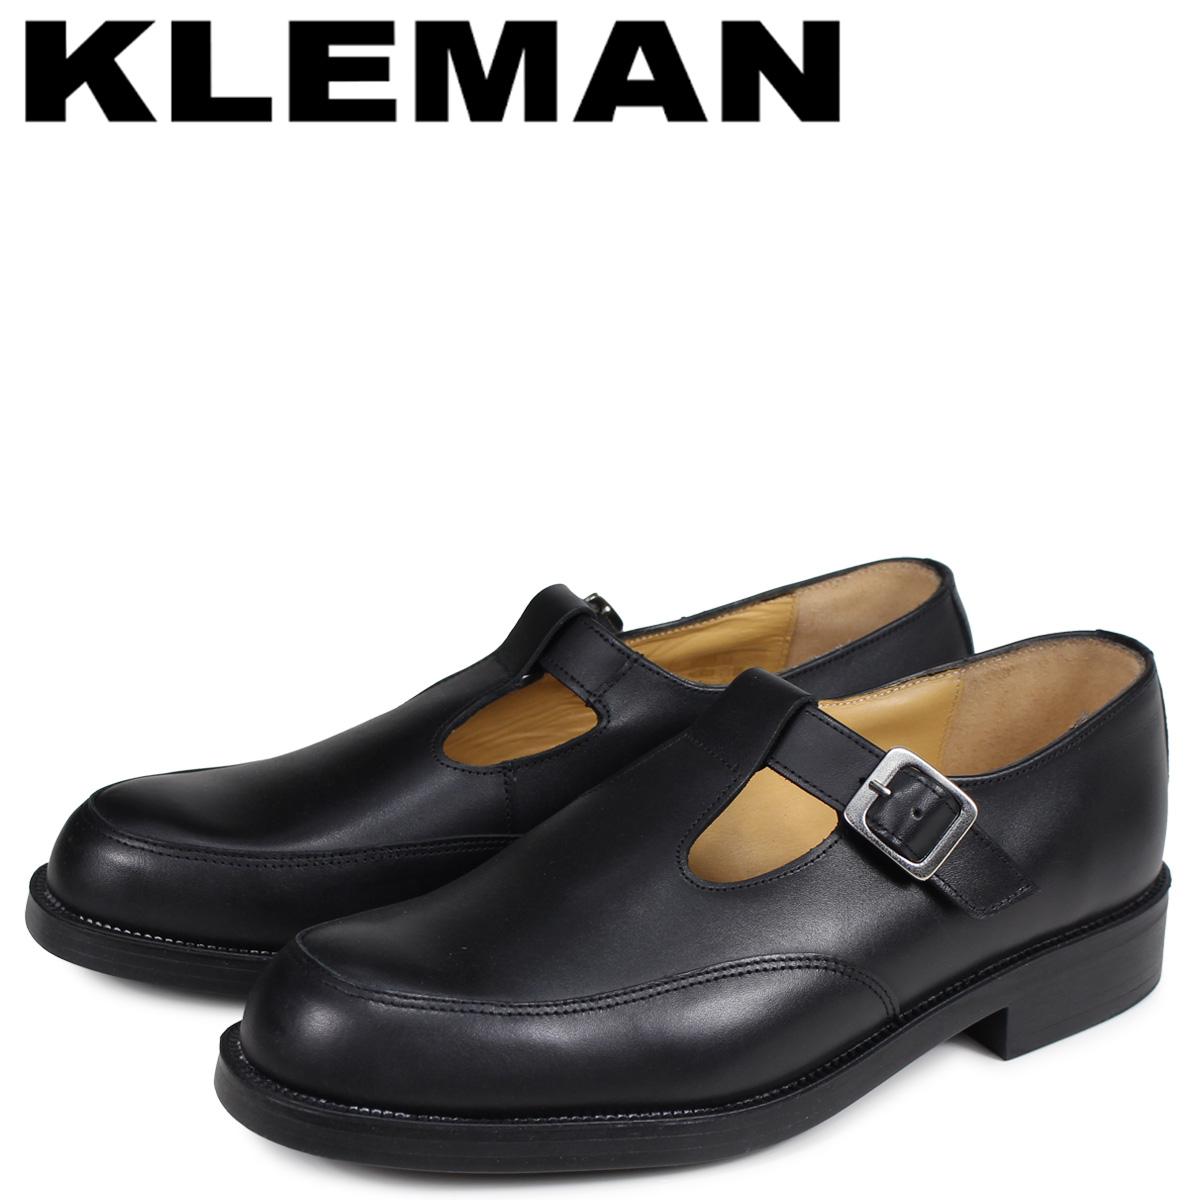 KLEMAN クレマン デイジー 靴 Tストラップ シューズ メンズ DAISY OR ブラック 黒 XA54102